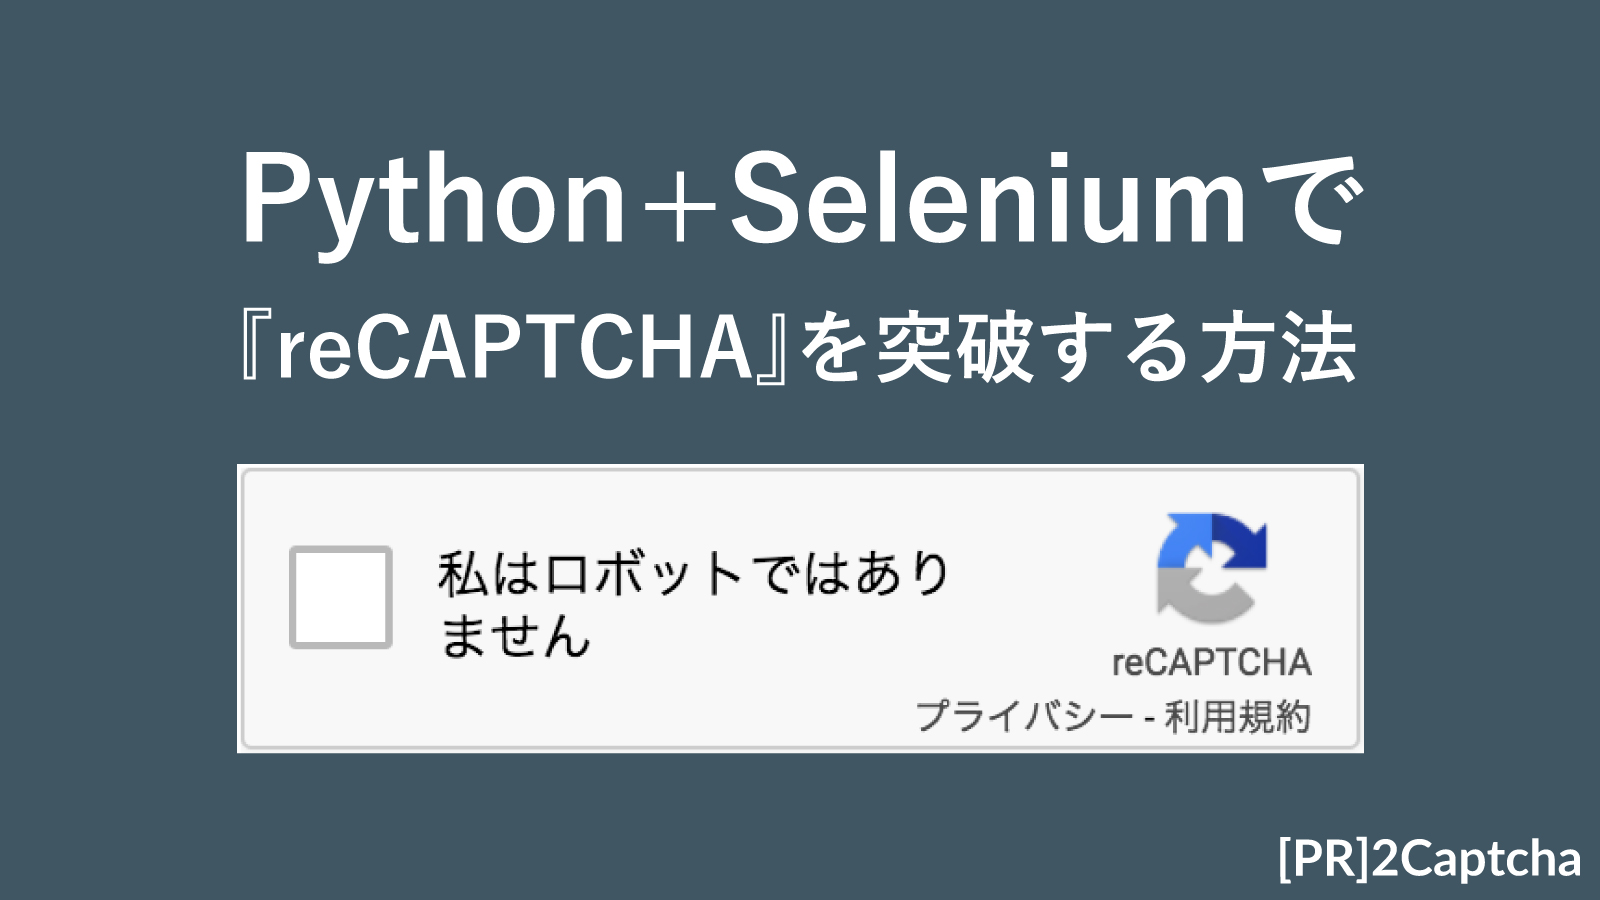 【2Captcha】Python+Seleniumで『reCAPTCHA』を突破する方法